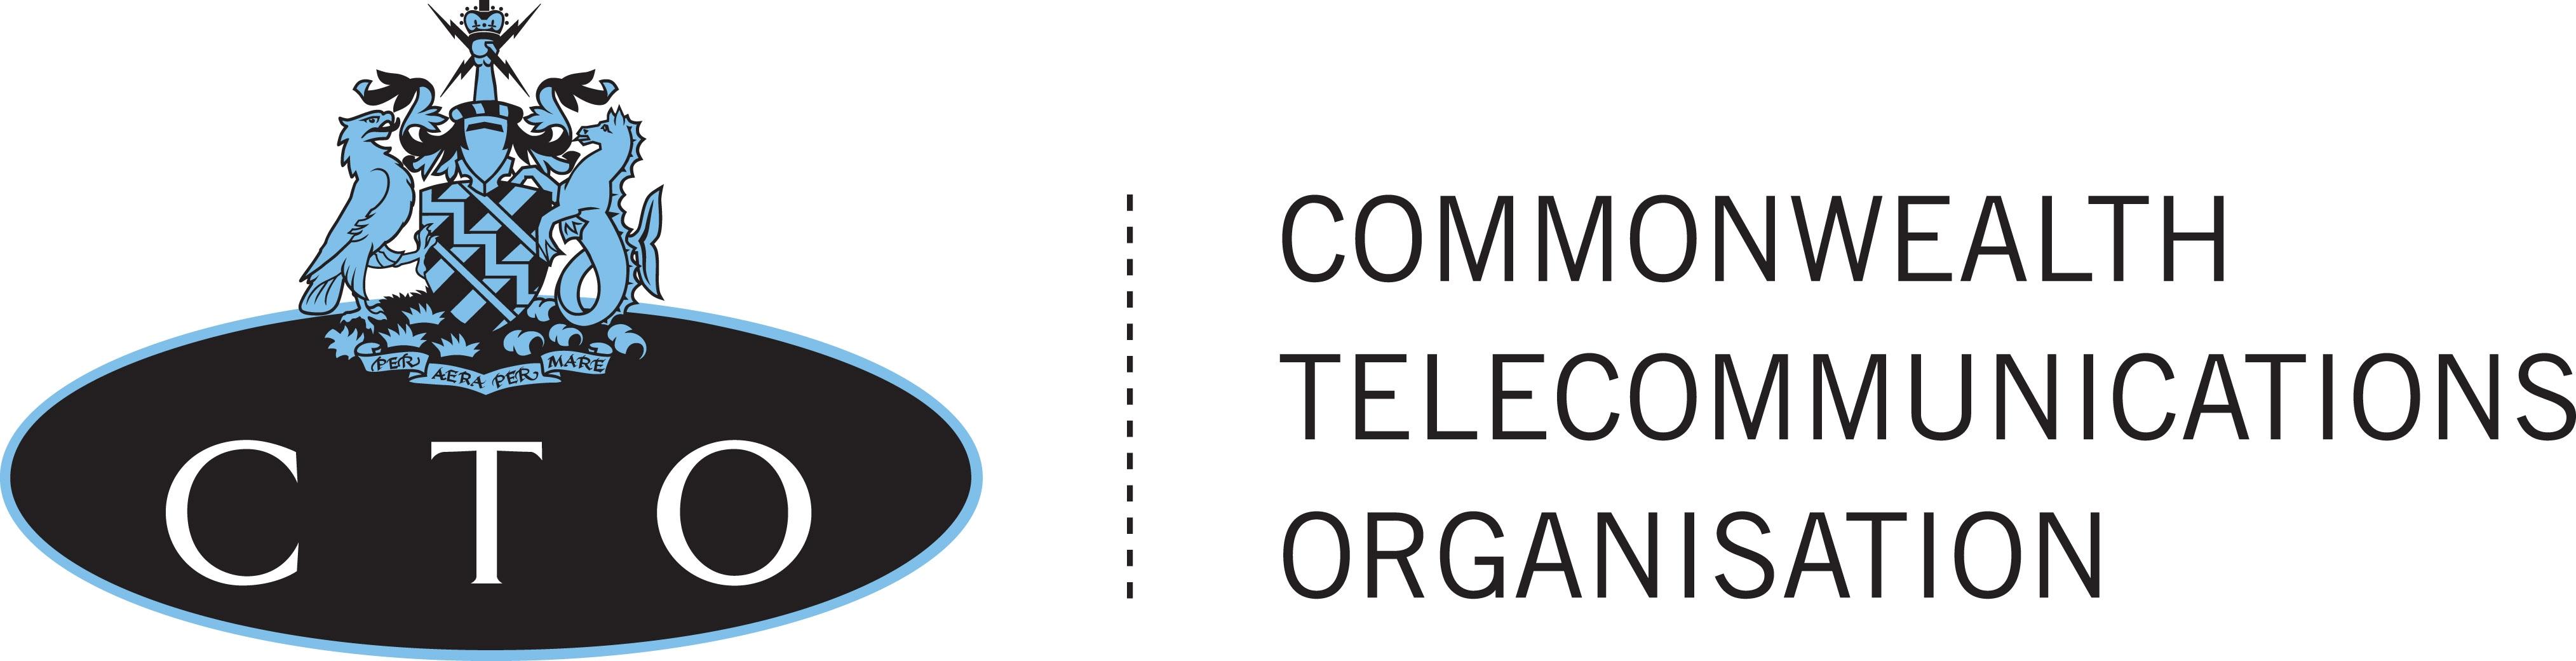 CTO telecom forum kicks off  in Dhaka